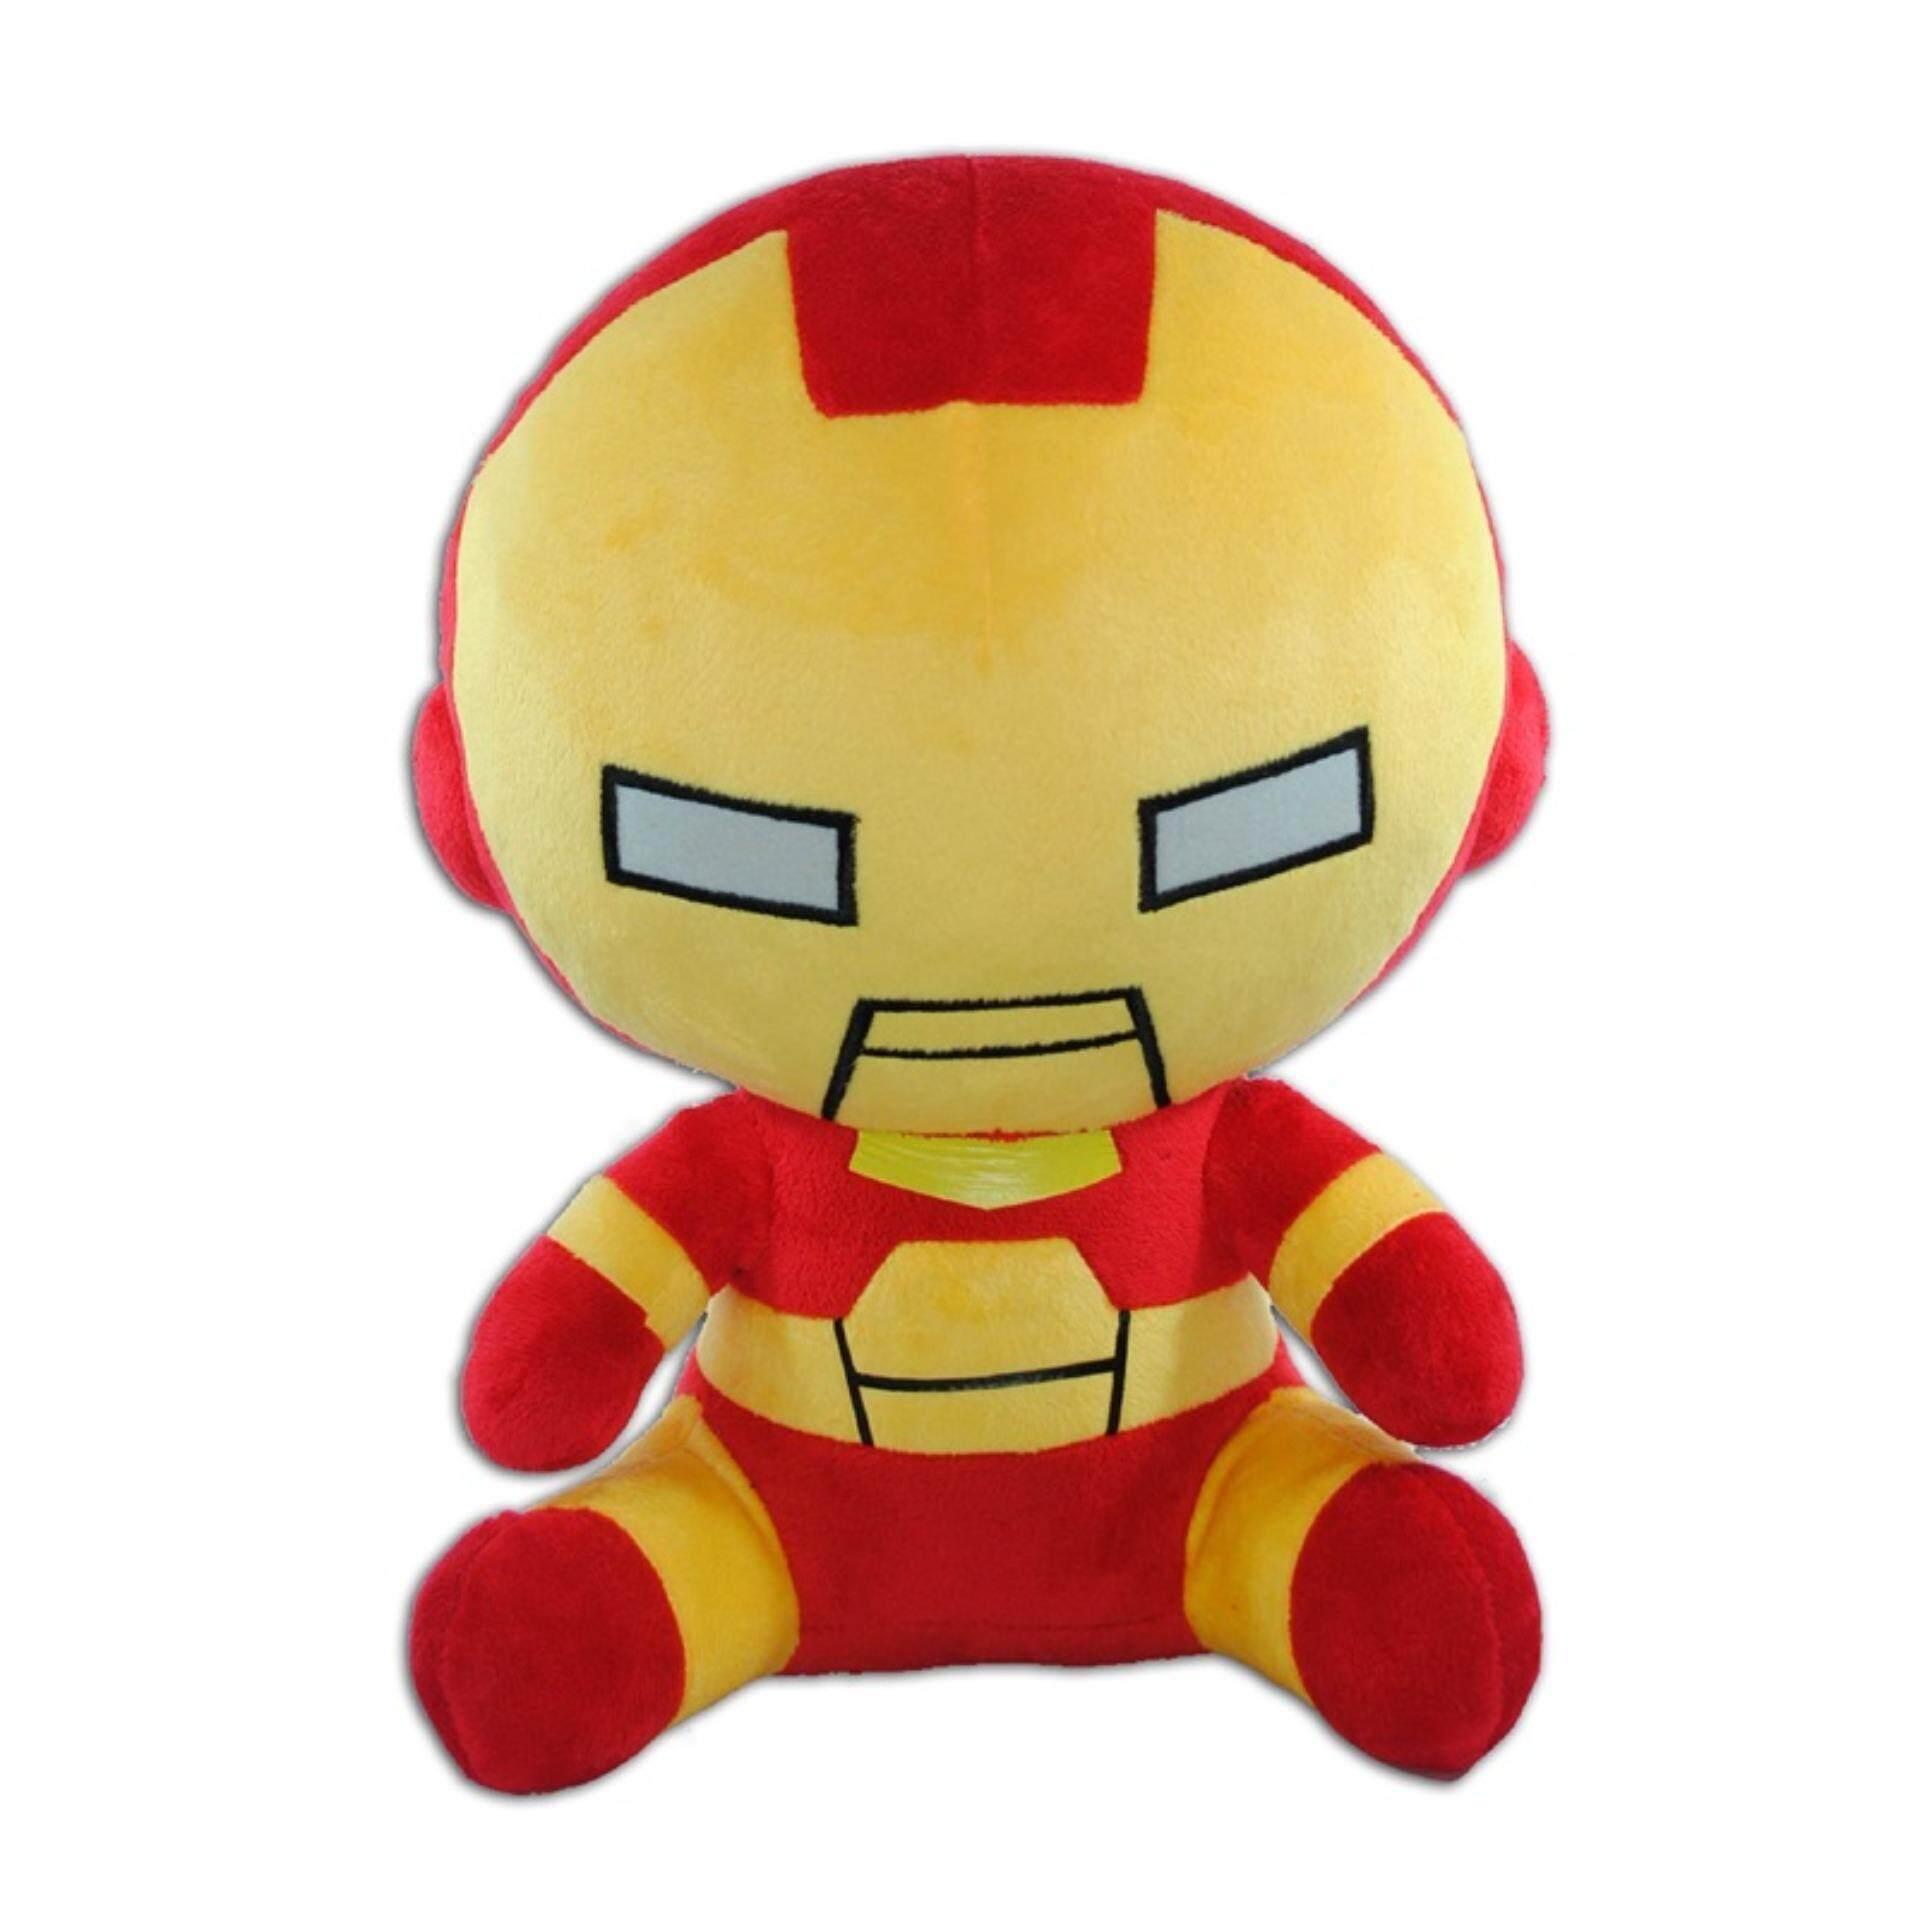 Marvel Avengers Kawaii Plush Toys 12 Inches - Iron Man